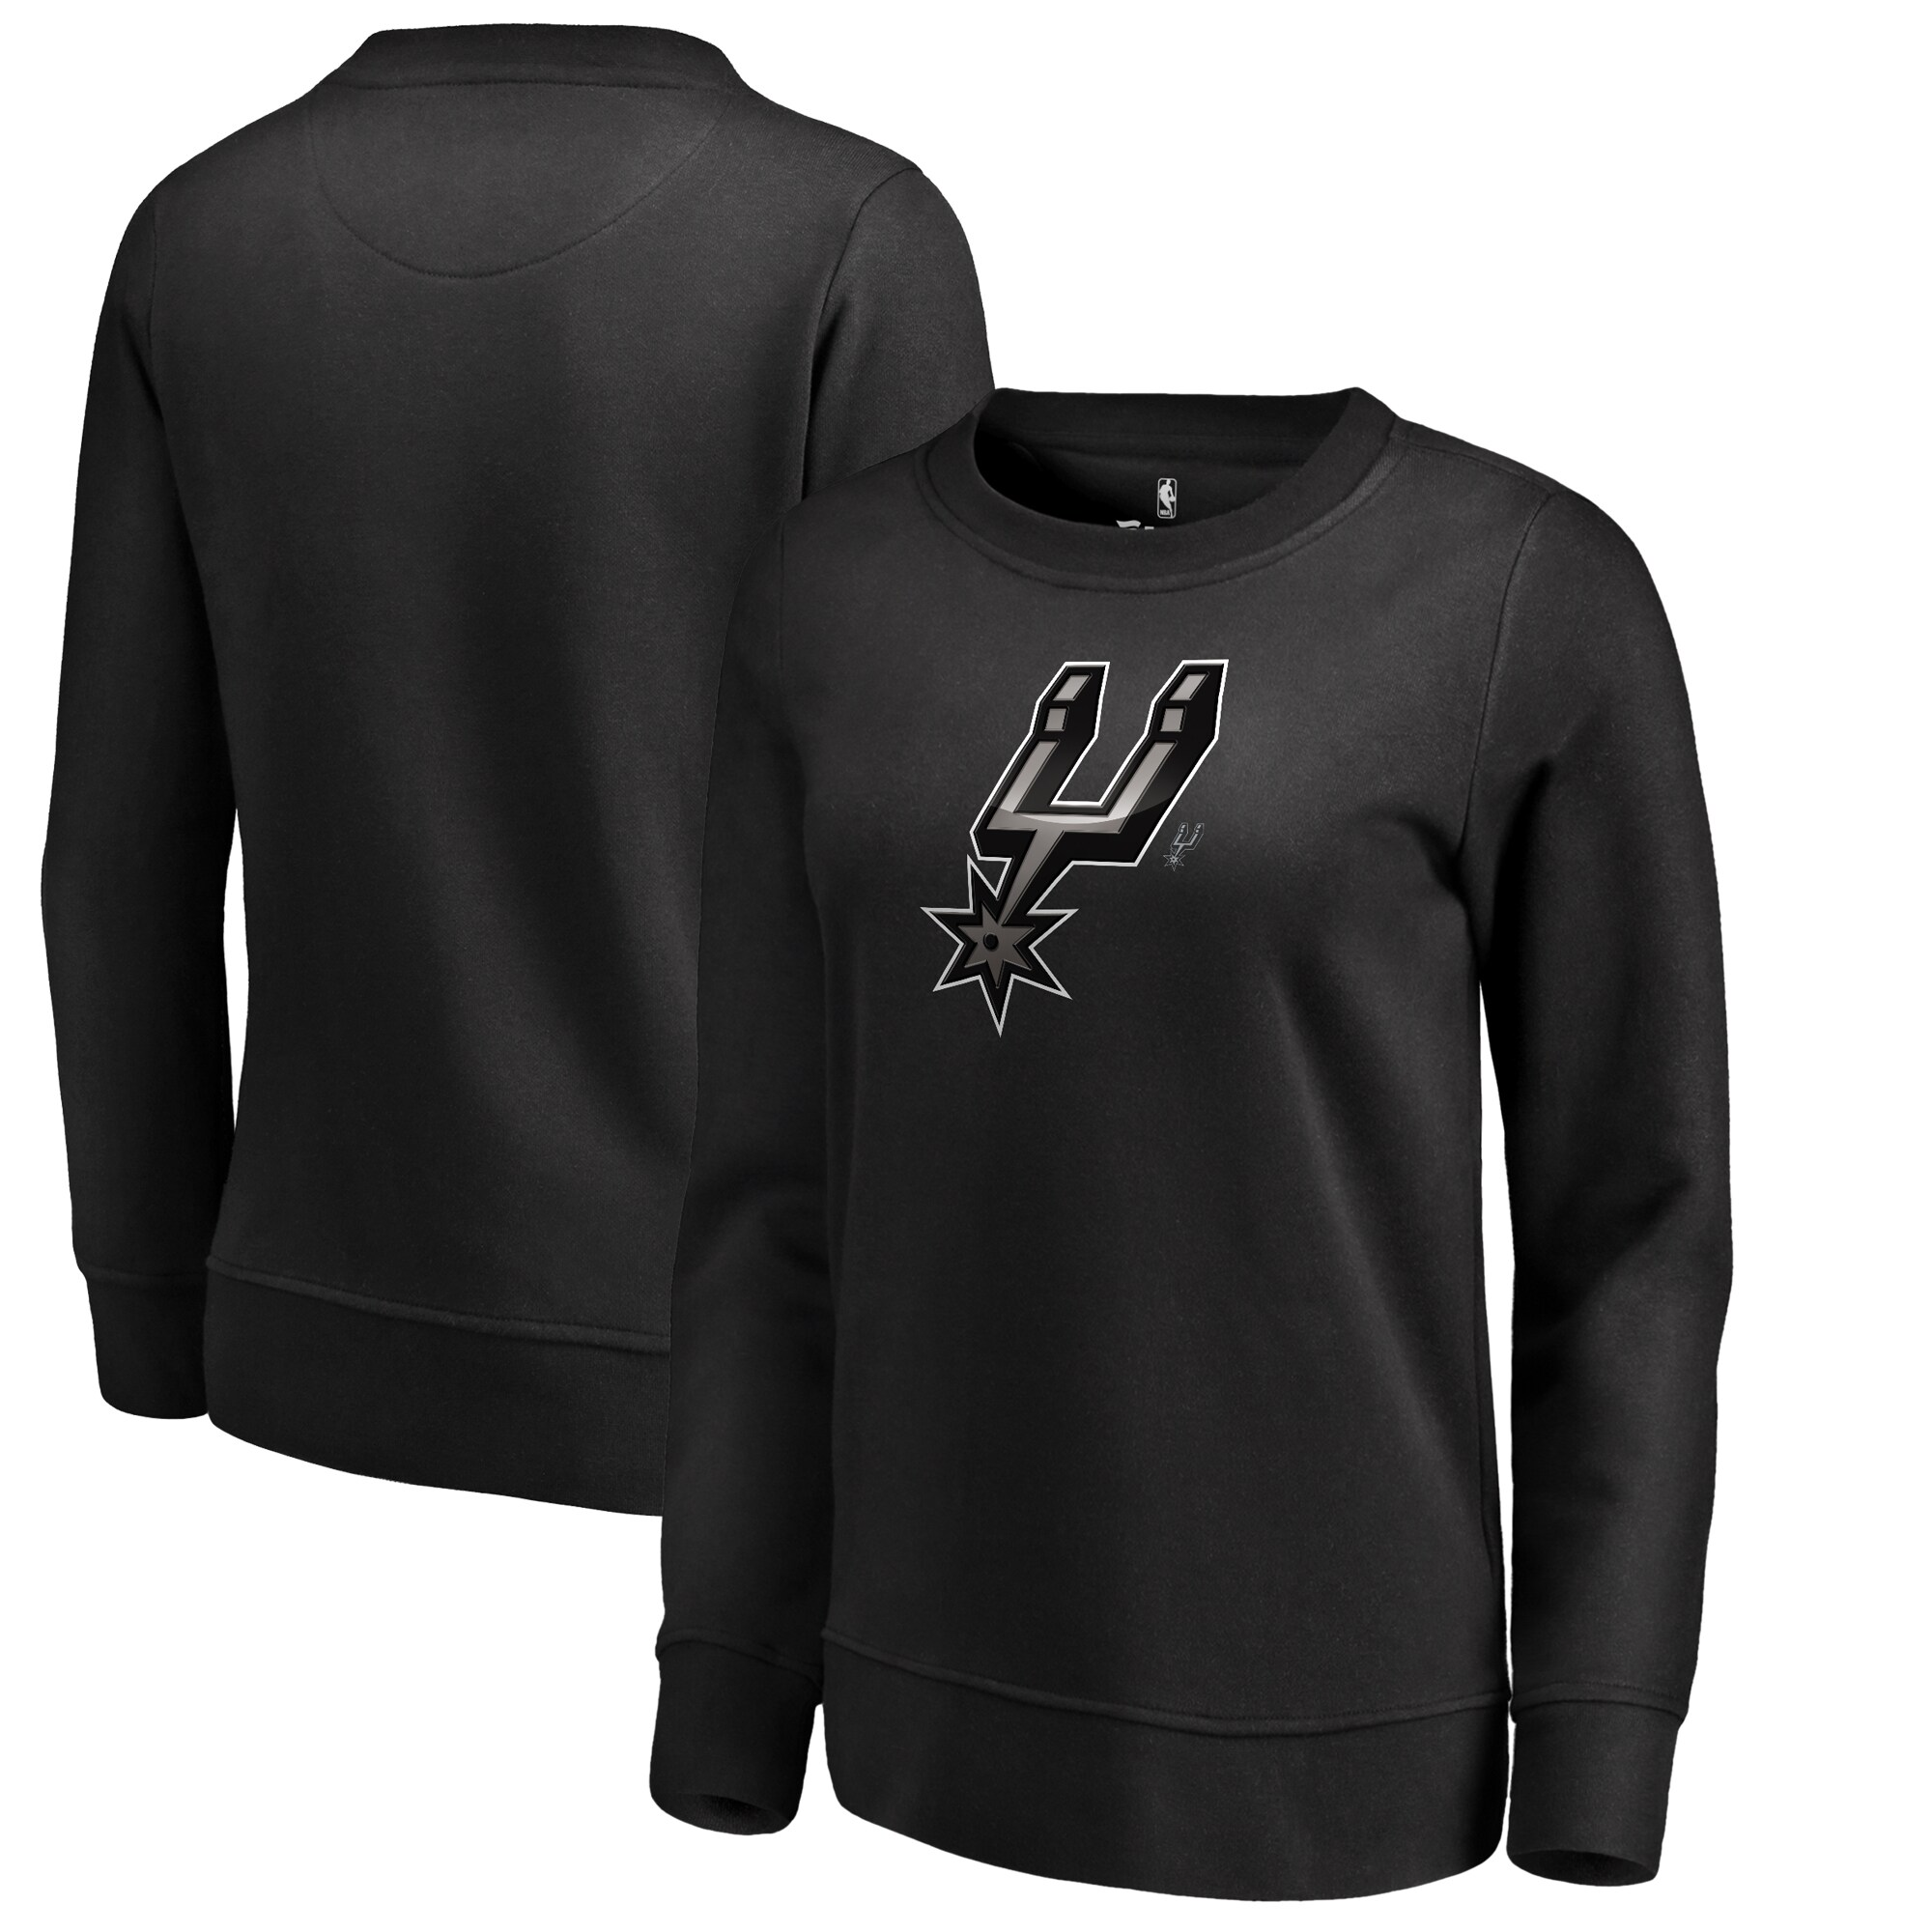 San Antonio Spurs Fanatics Branded Women's Midnight Mascot Pullover Sweatshirt - Black